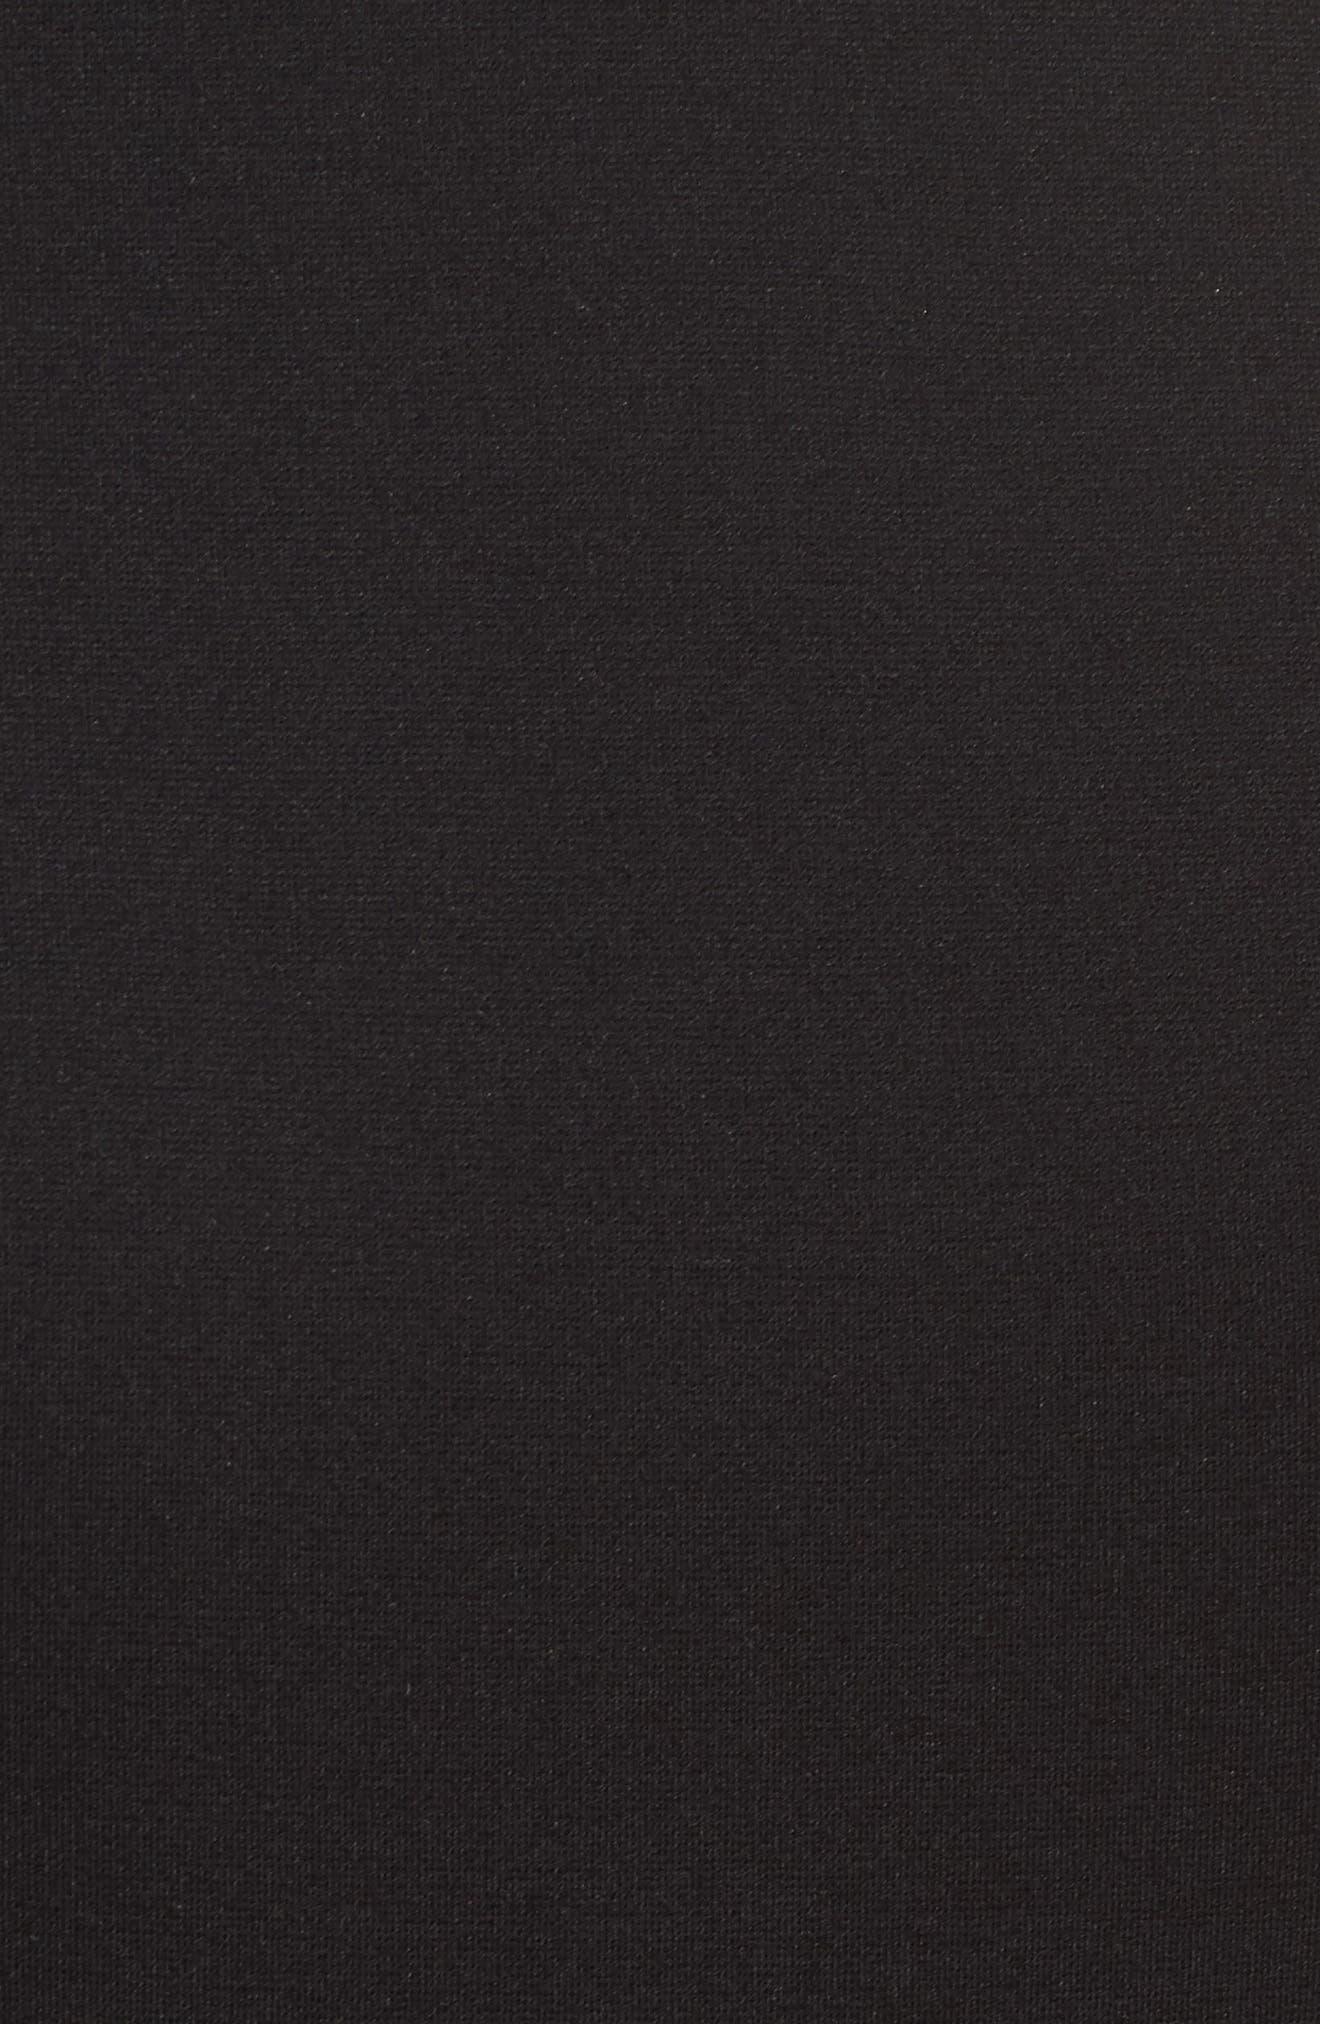 Peplum Jumpsuit,                             Alternate thumbnail 5, color,                             Black